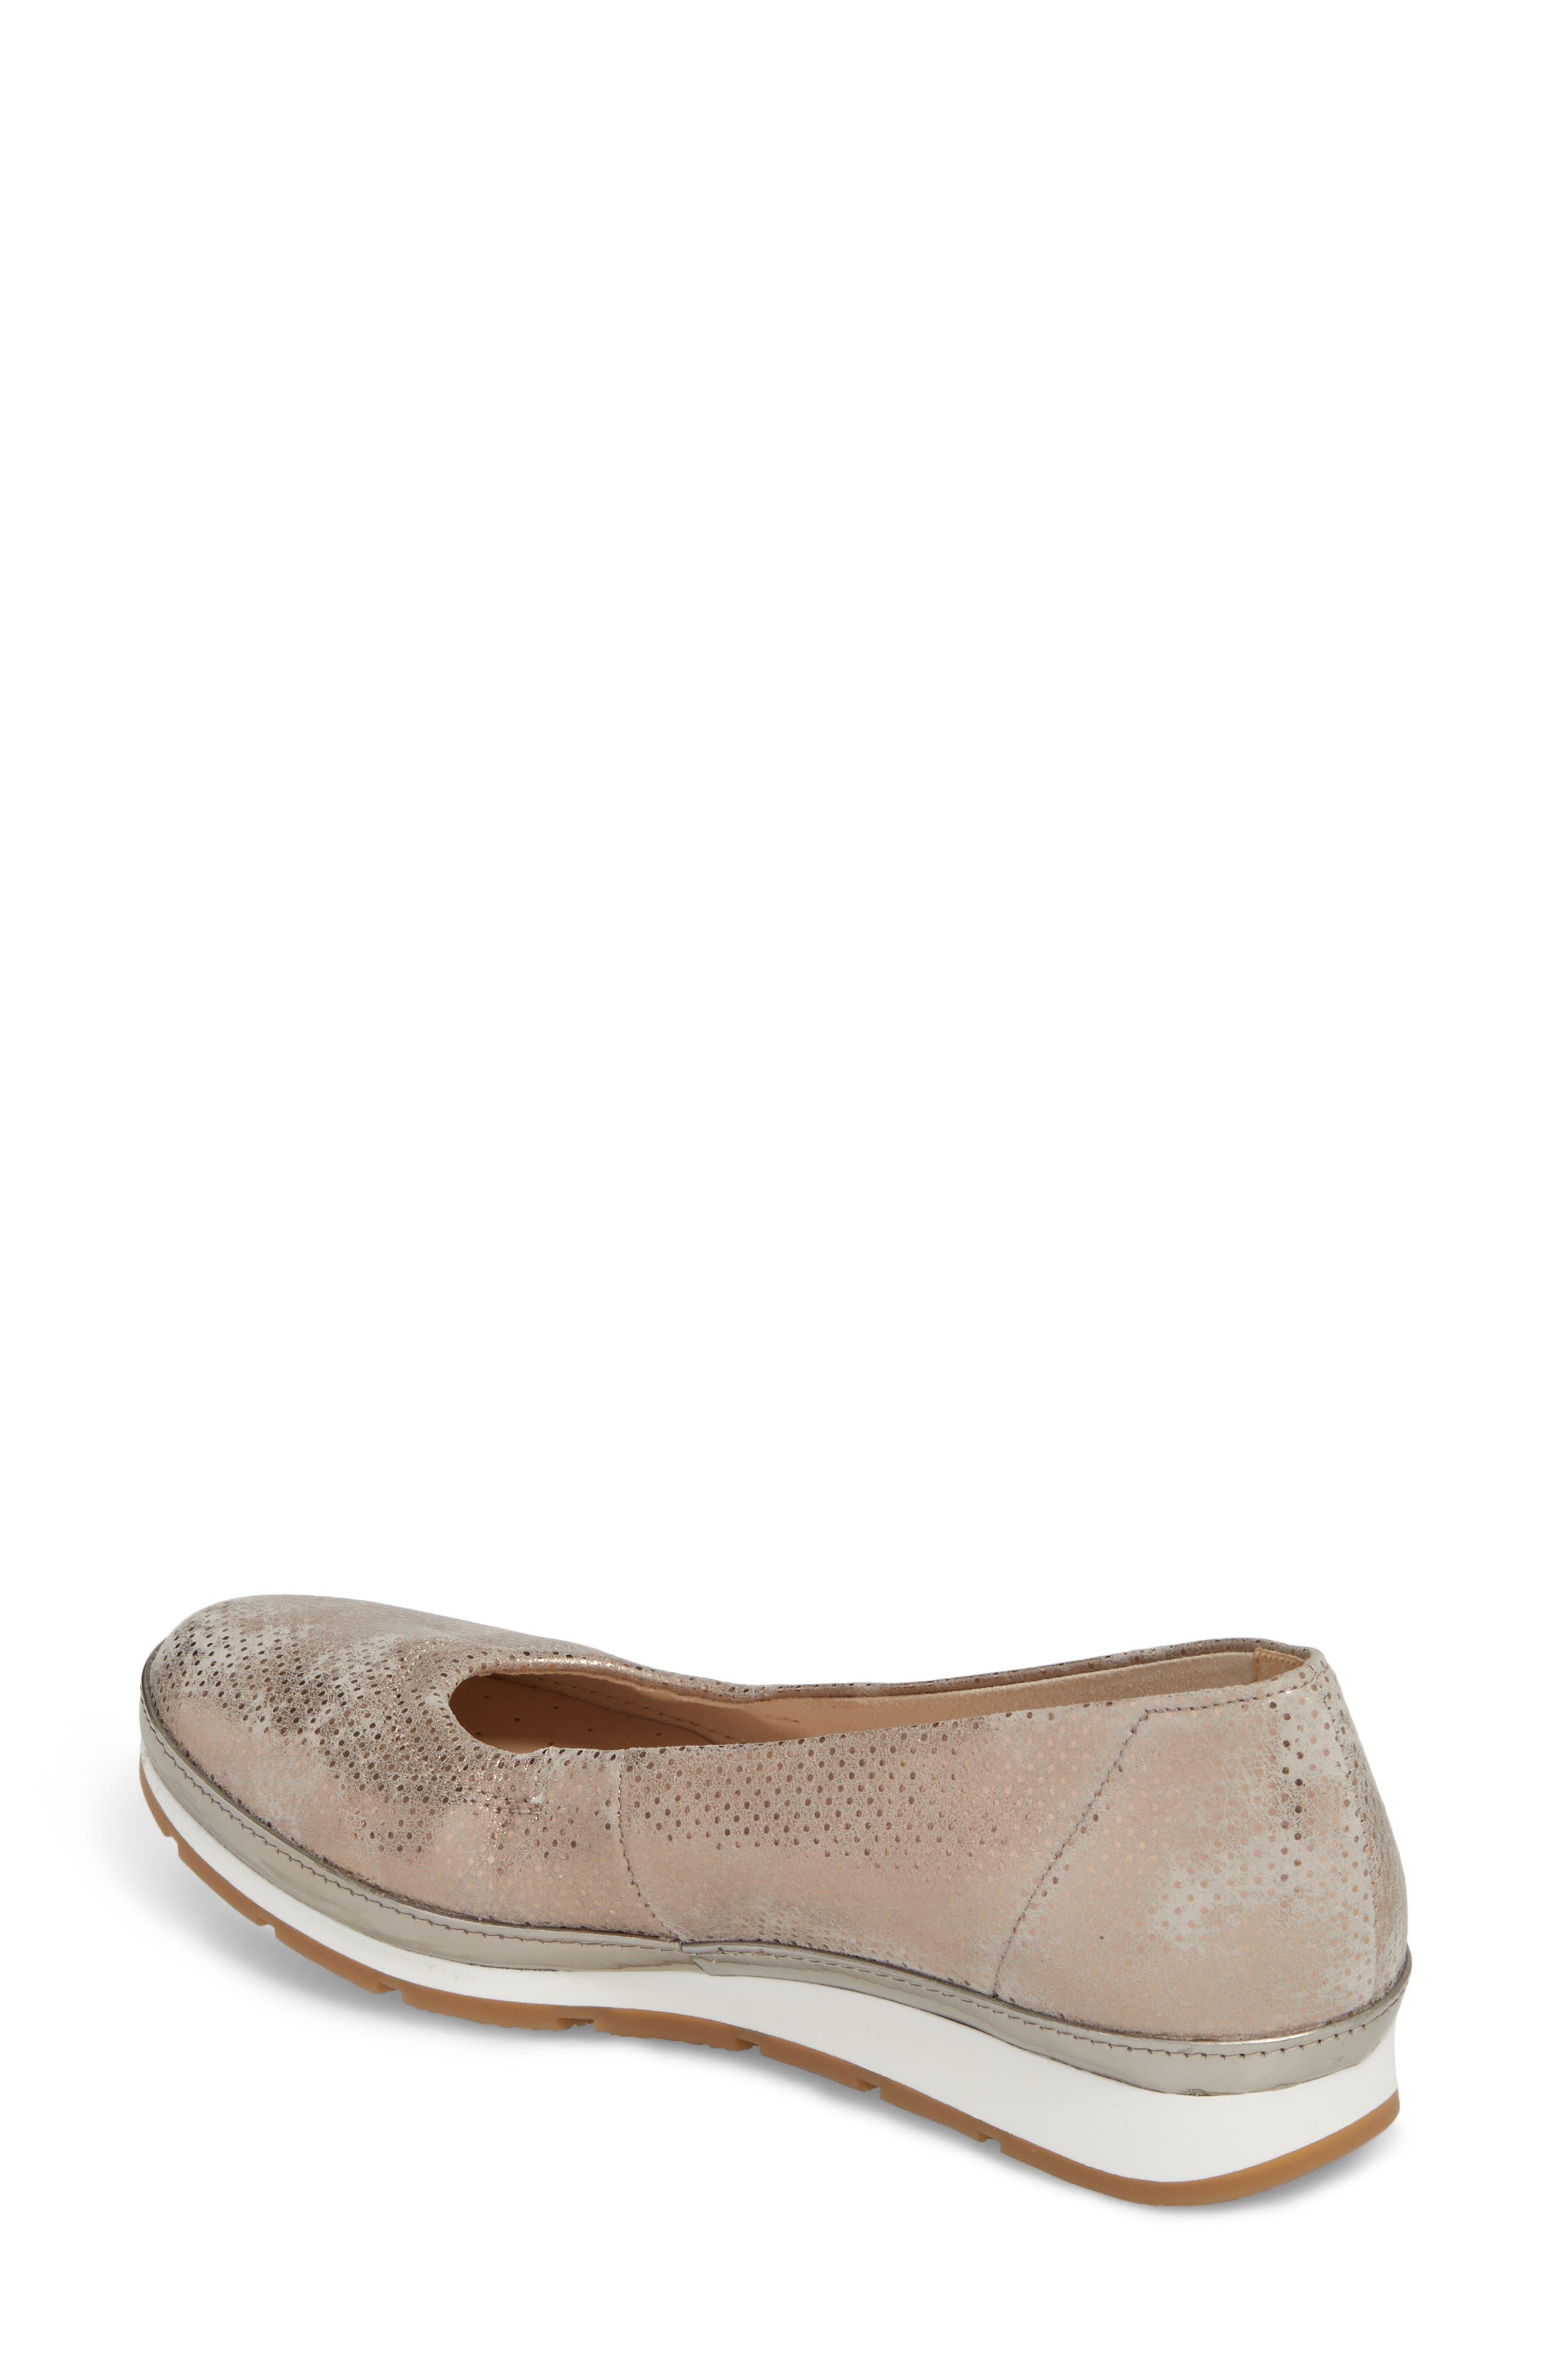 Ballet Wedge,                             Alternate thumbnail 2, color,                             Beige Metallic Leather